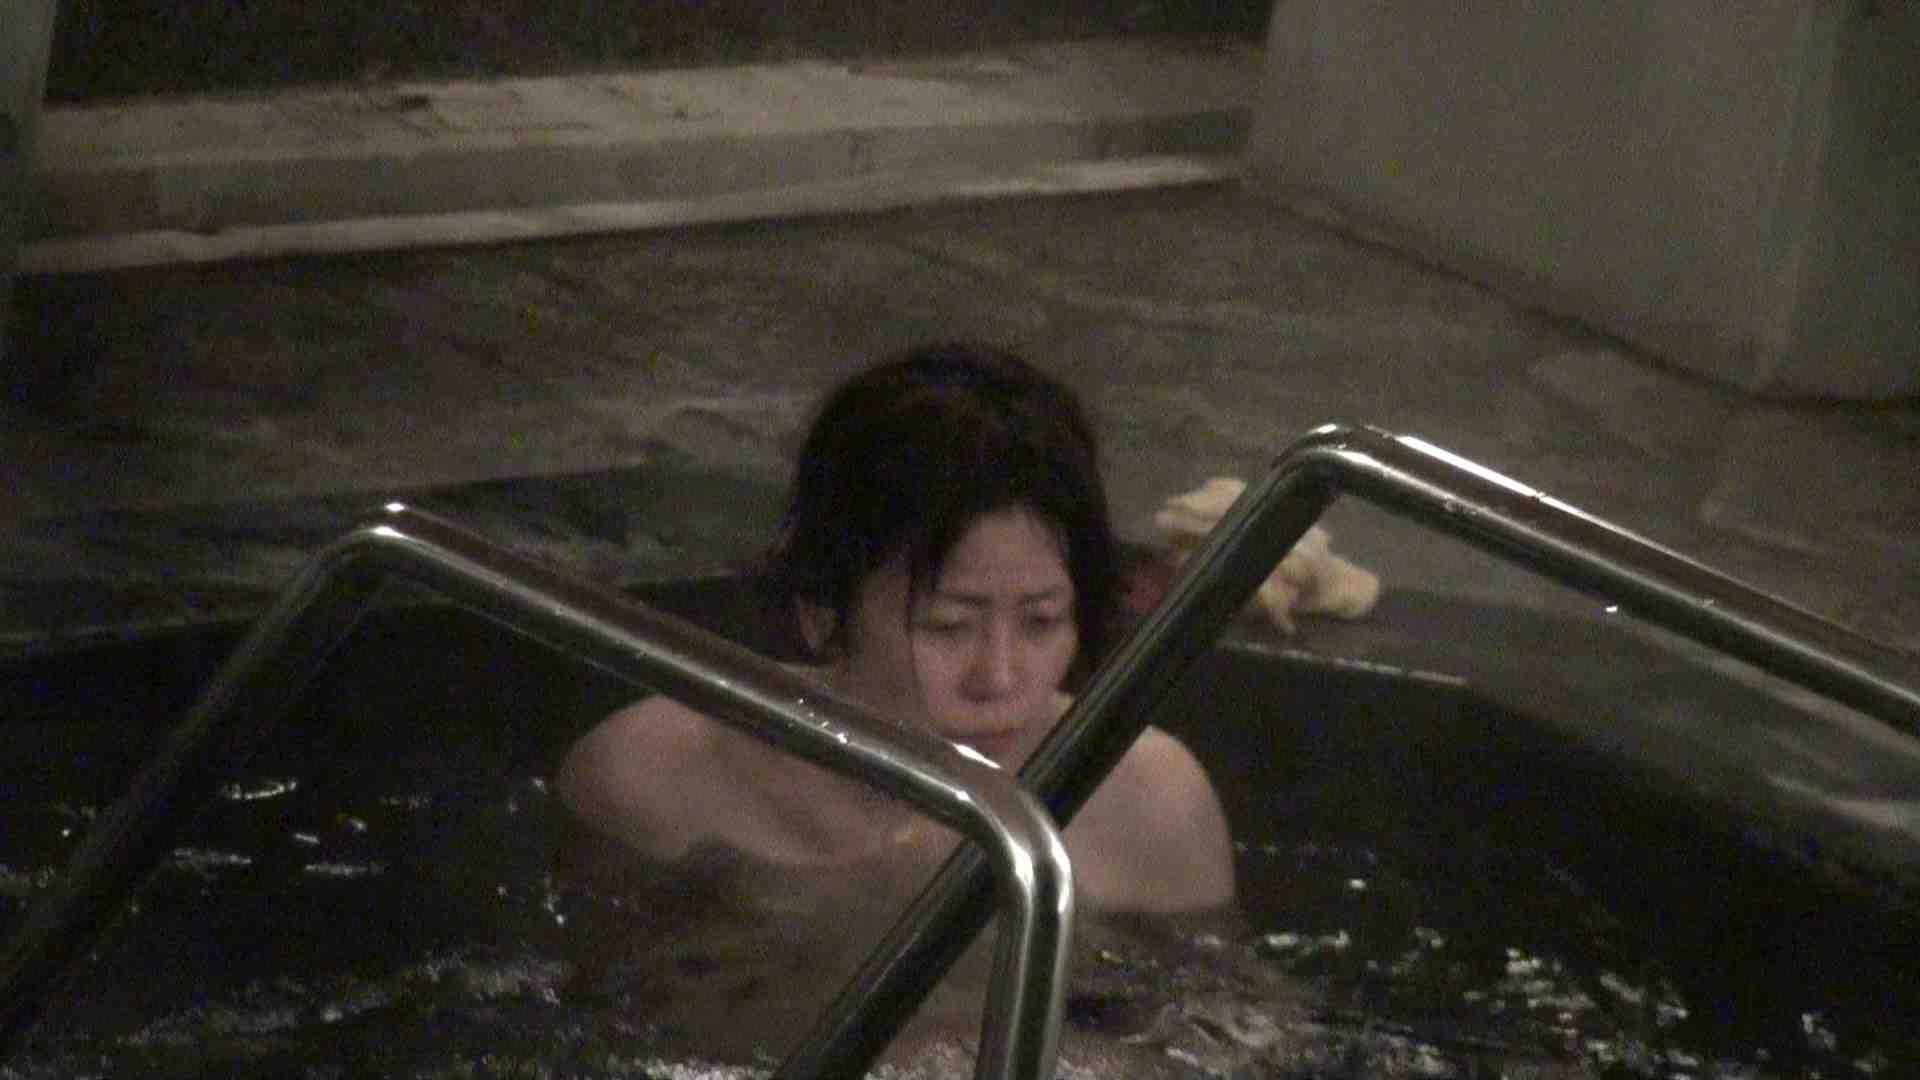 Aquaな露天風呂Vol.433 露天 | OLセックス  99画像 91